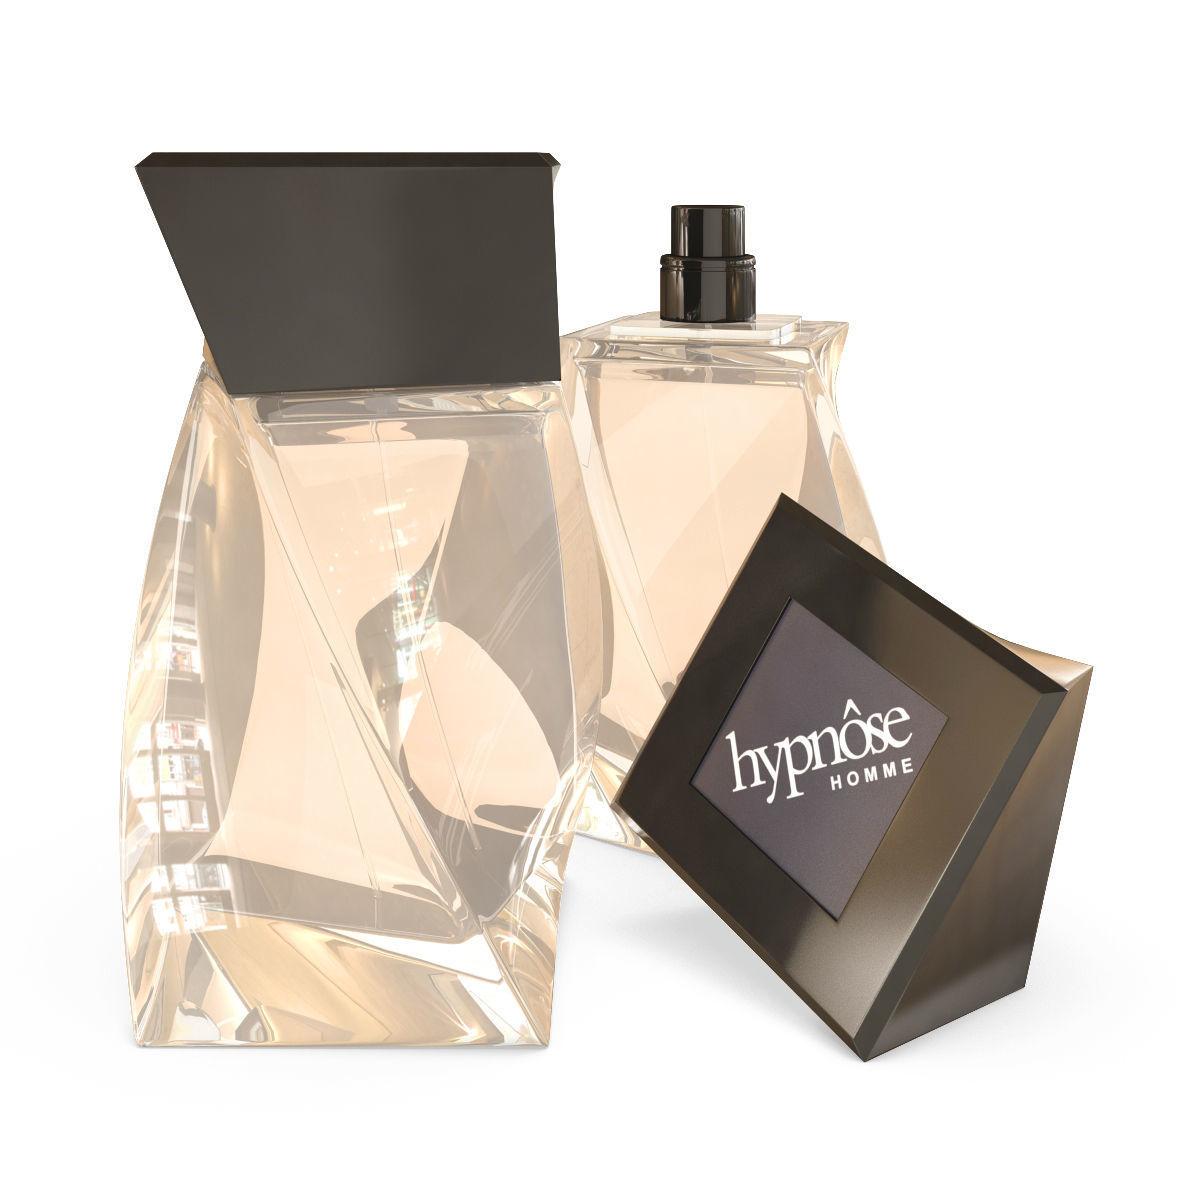 Lancome Model Lancome Homme Perfume3d Hypnose TK5uFc3l1J